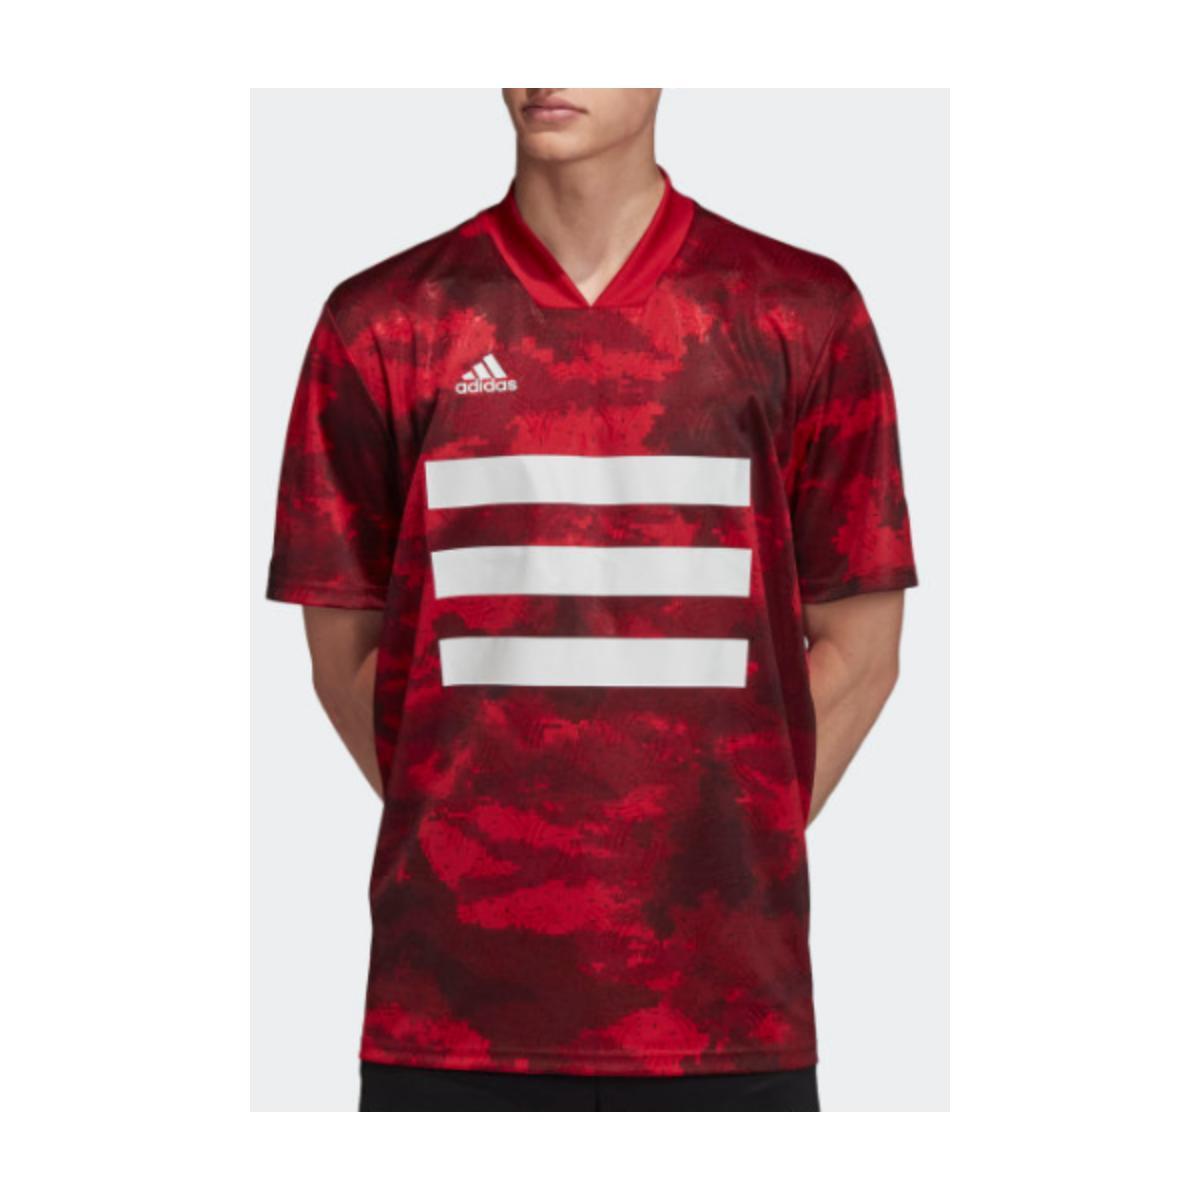 Camisa Masculina Adidas Dz9537 Tan Aop Jsy Vermelho